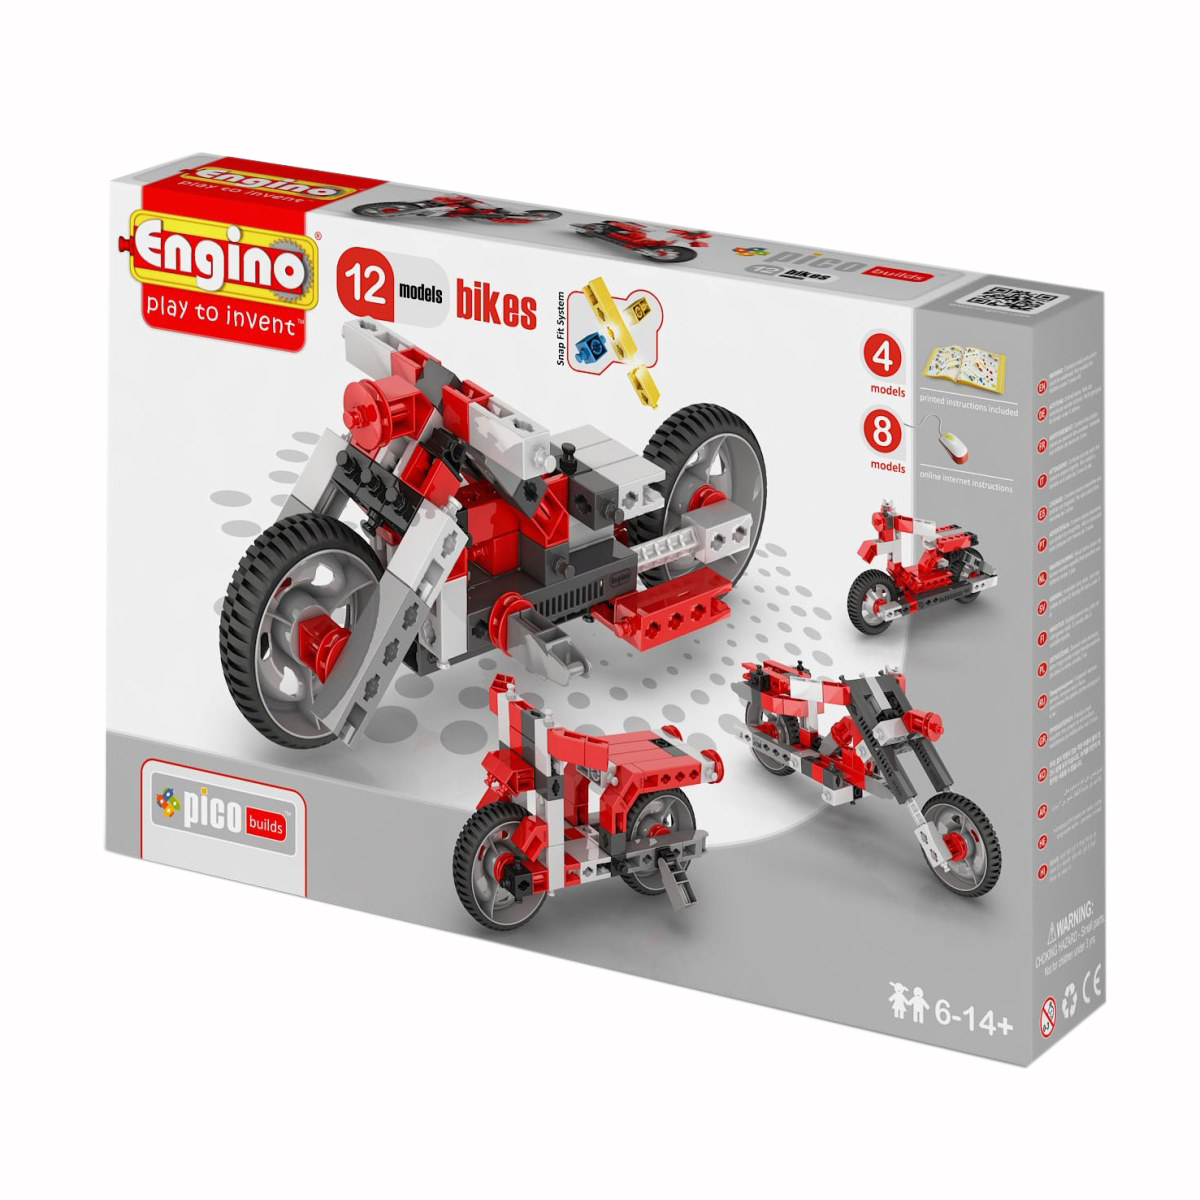 Конструктор Pico Builds Inventor - Мотоциклы, 86 деталей фото